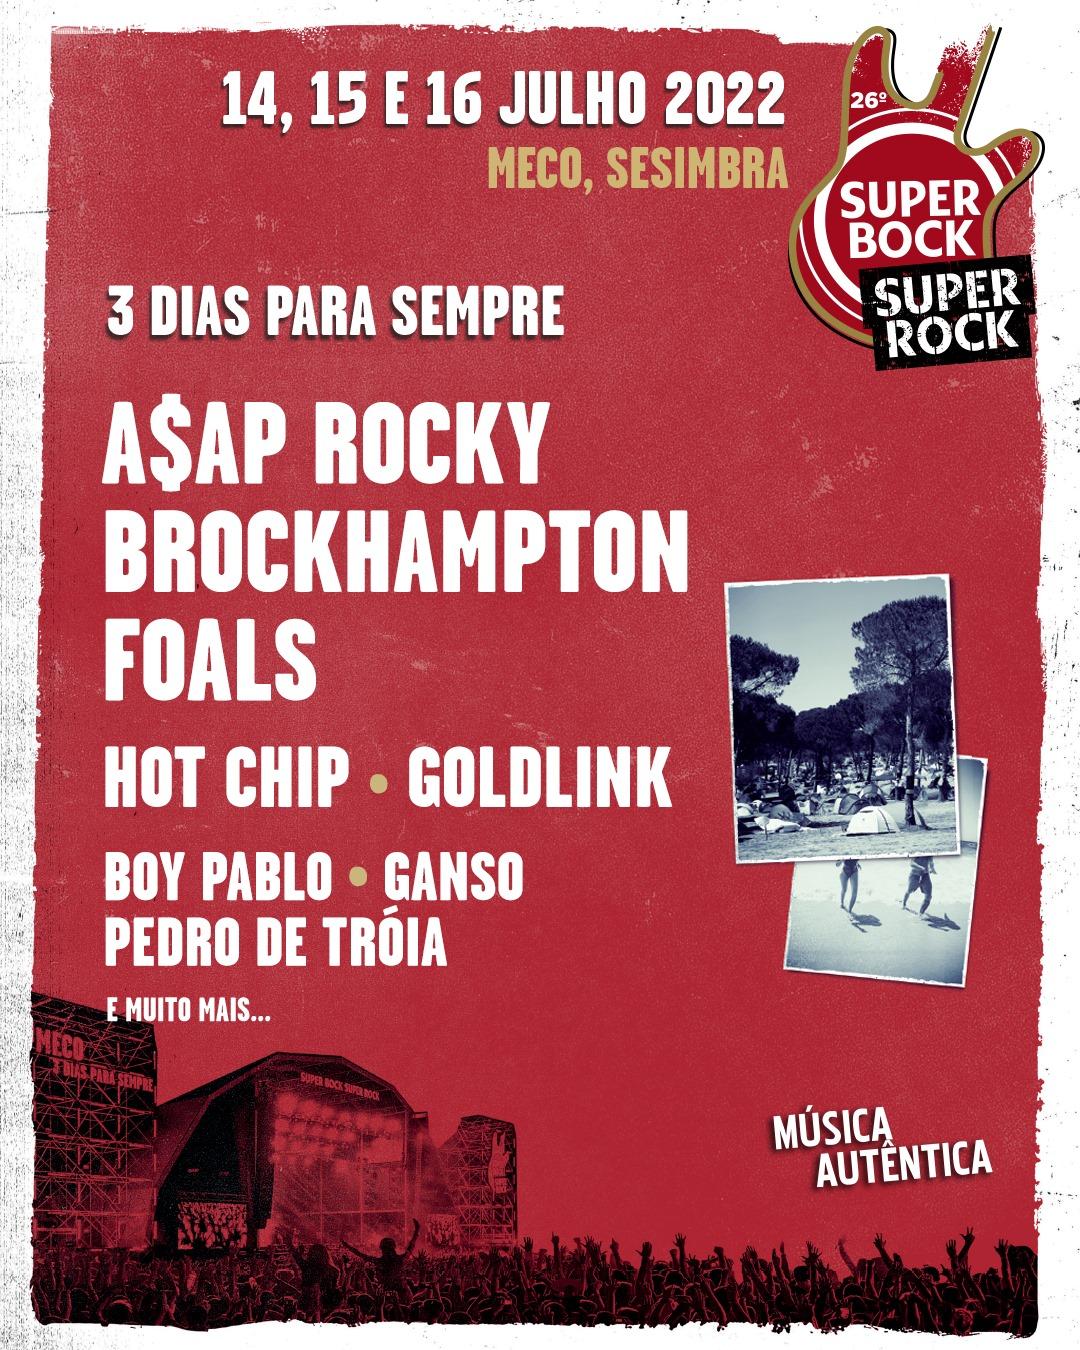 Primeras confirmaciones del Super Bock Super Rock 2022